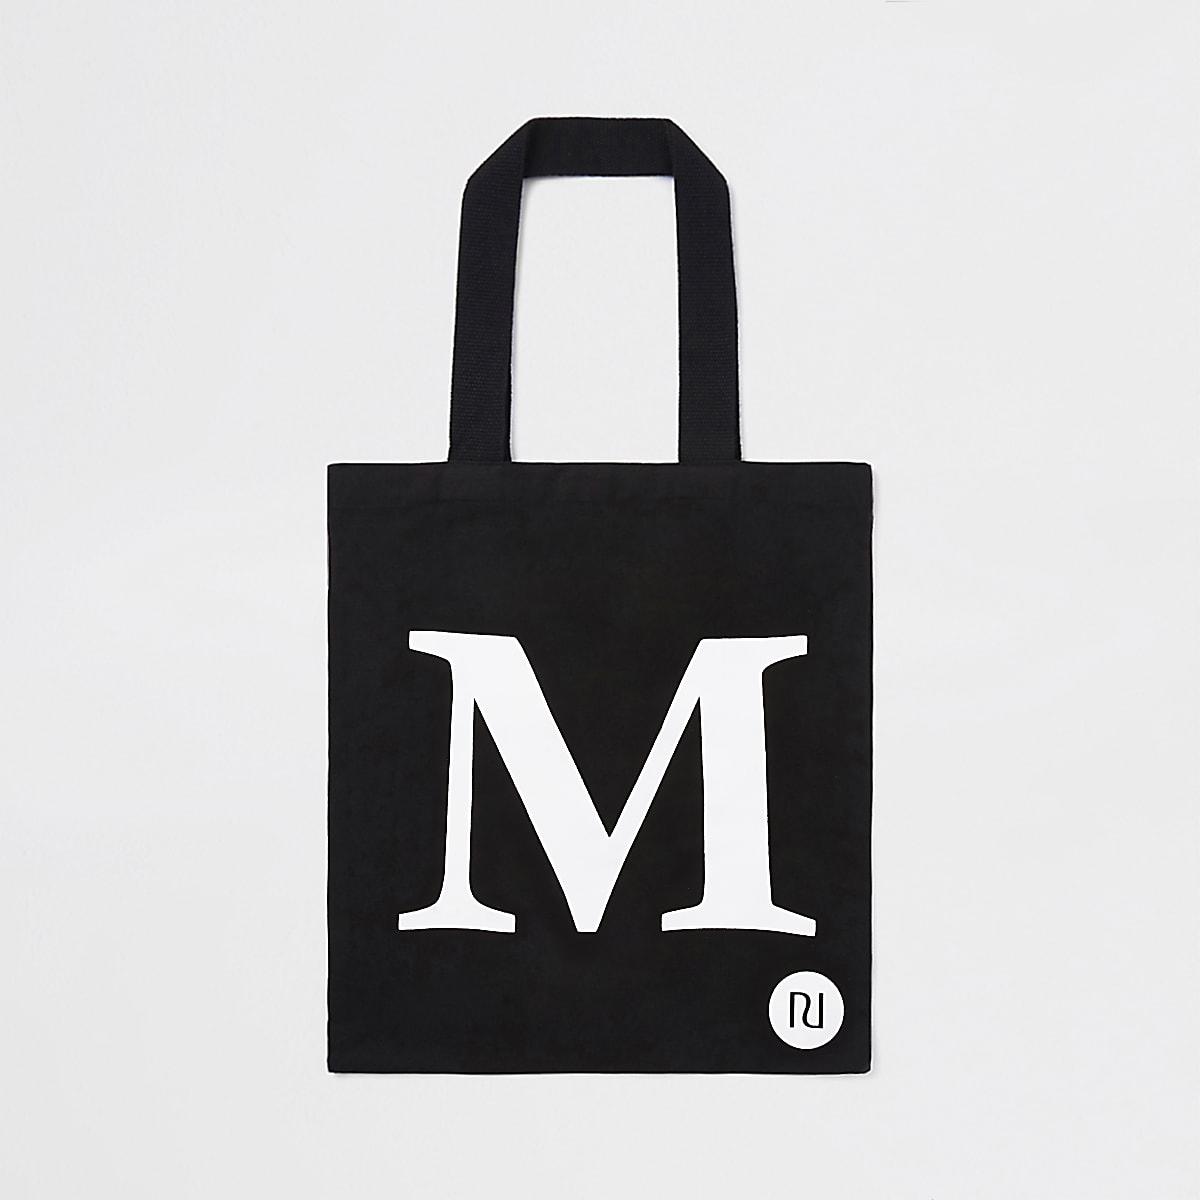 Zwarte shoppertas met 'M'-initiaal